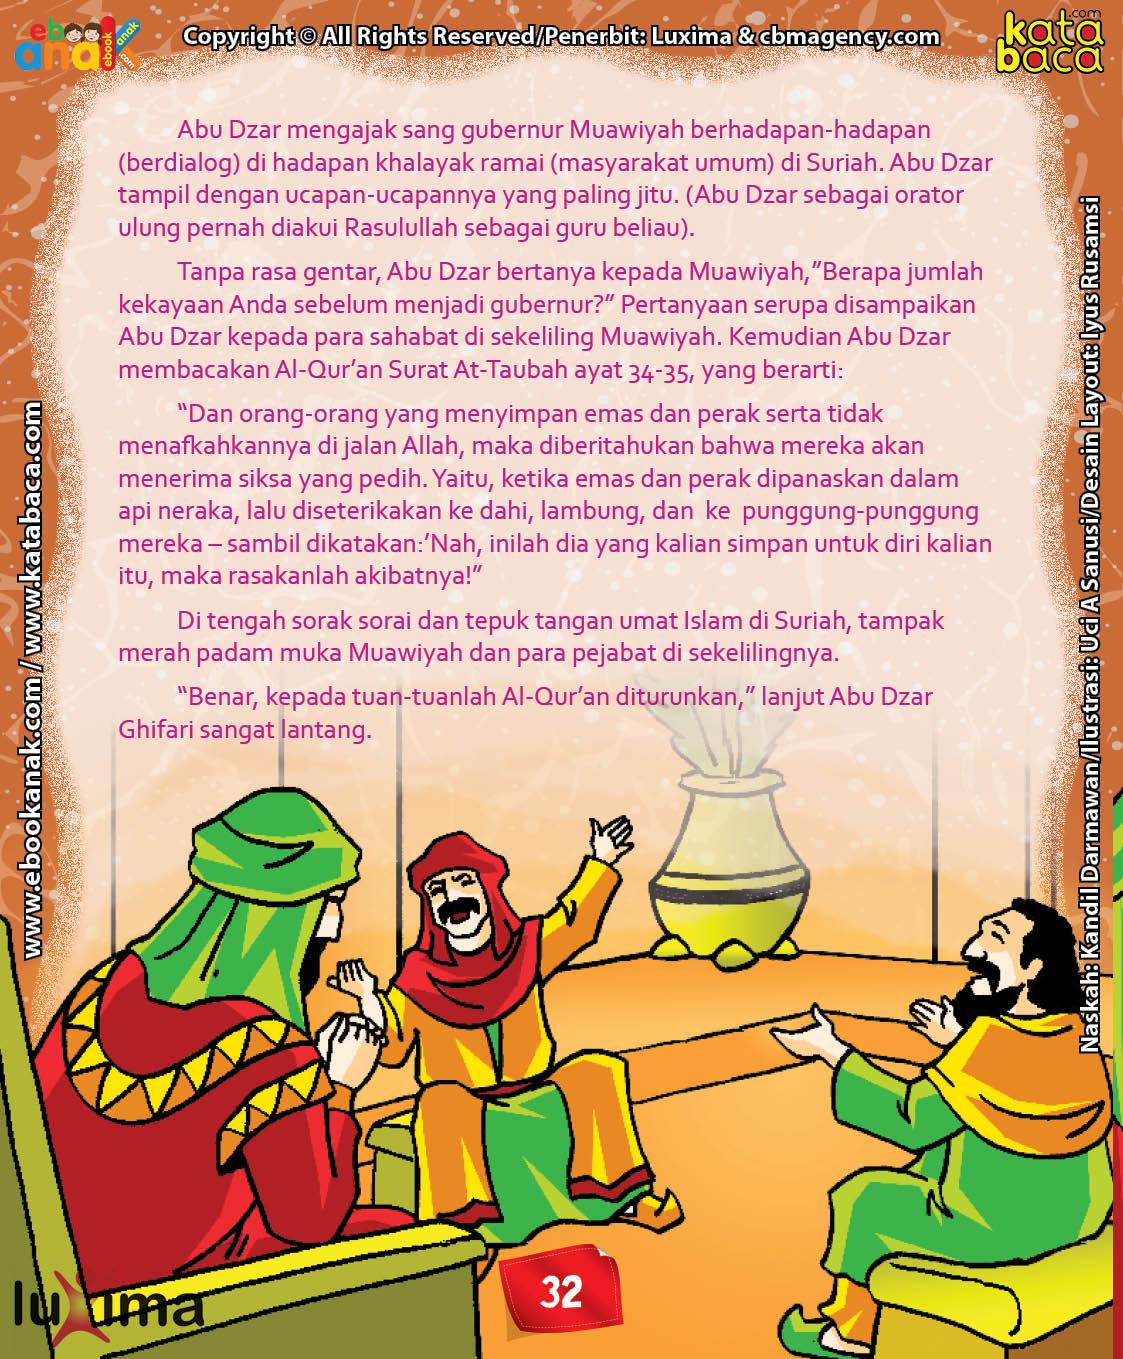 Download Ebook Abu Dzar Al Ghifari, Kenapa Wajah Muawiyah Menjadi Merah Padam